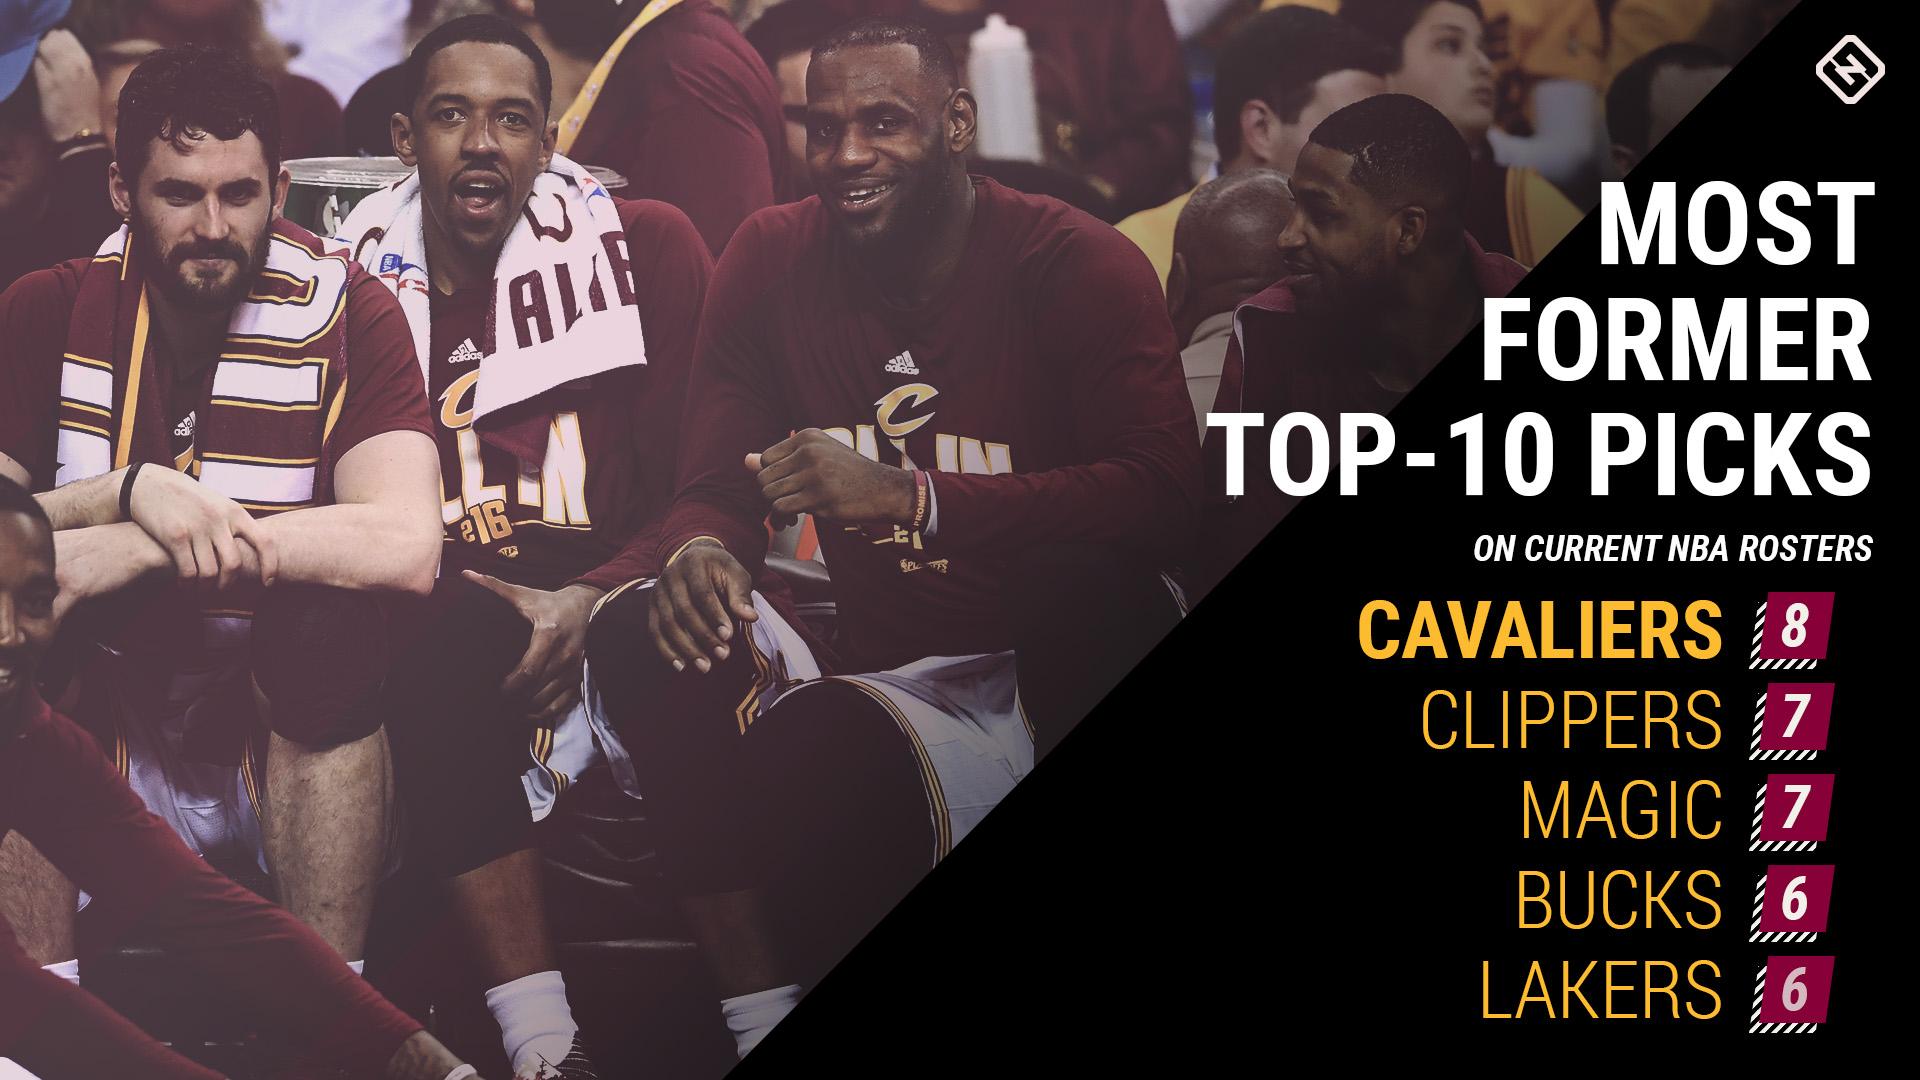 Cavs TOP-10